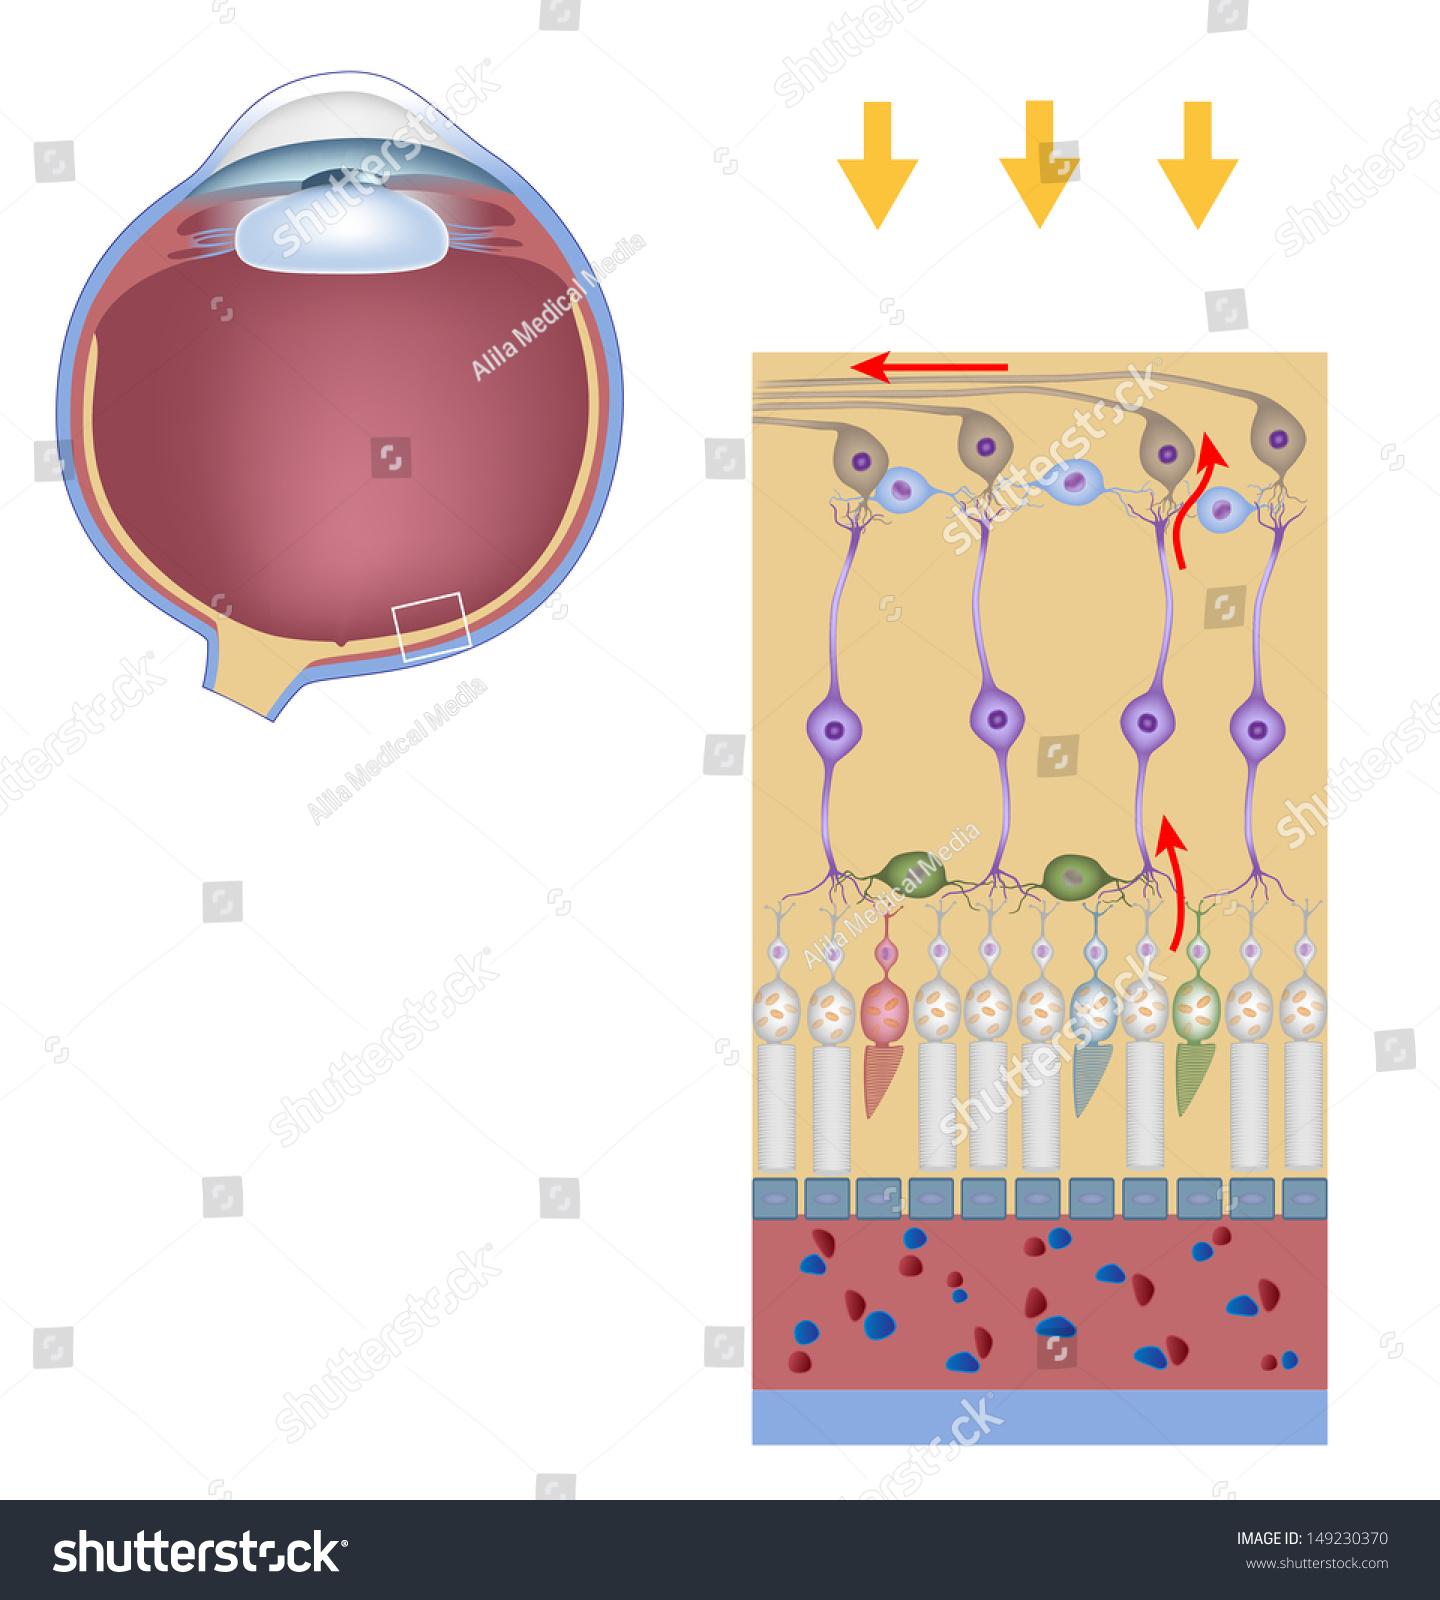 Layers Retina Science Drawing Stock Illustration 149230370 ...